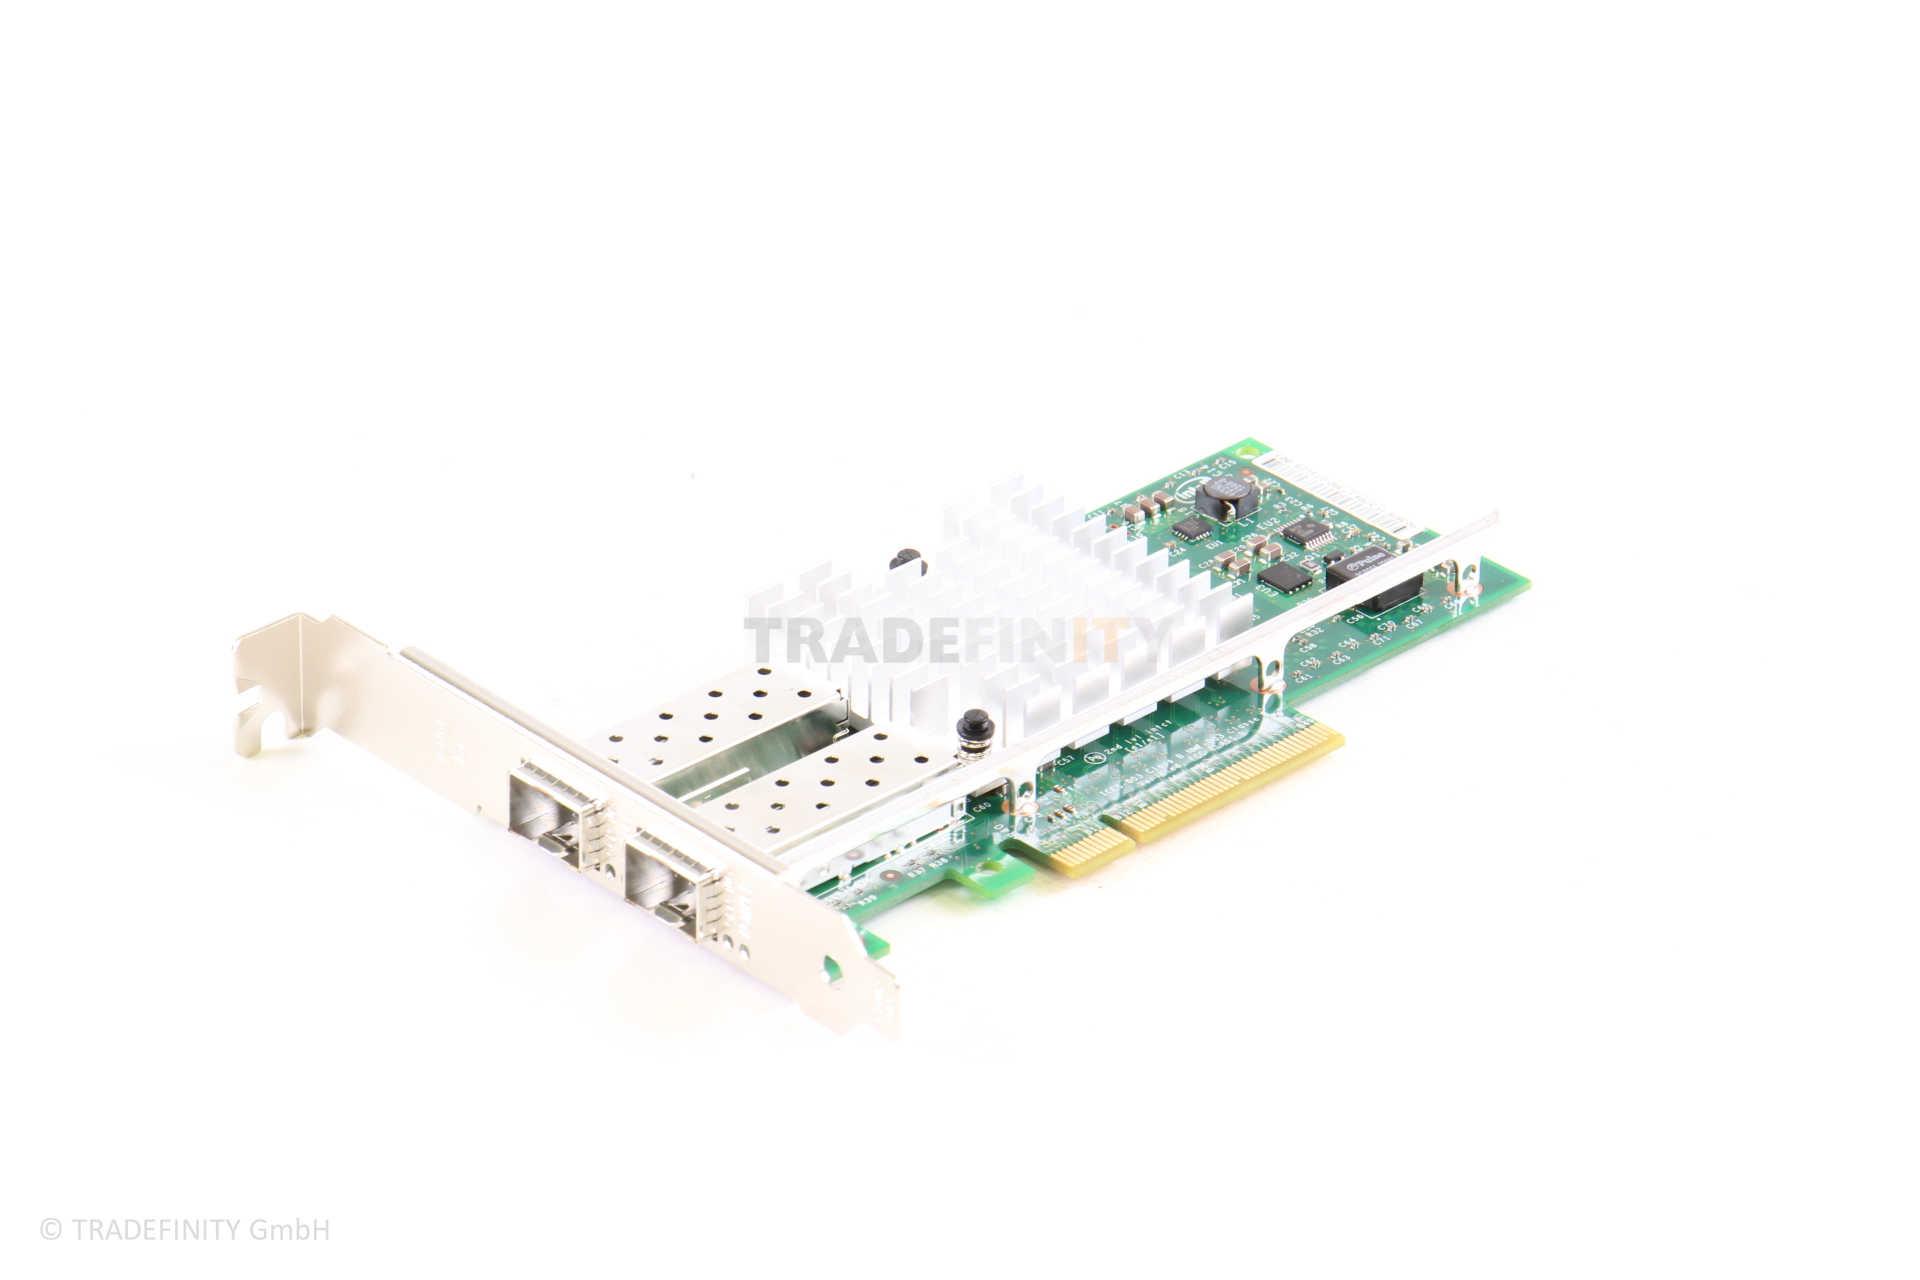 2-Port 10 GbE X520-DA2 Converged Network Adapter